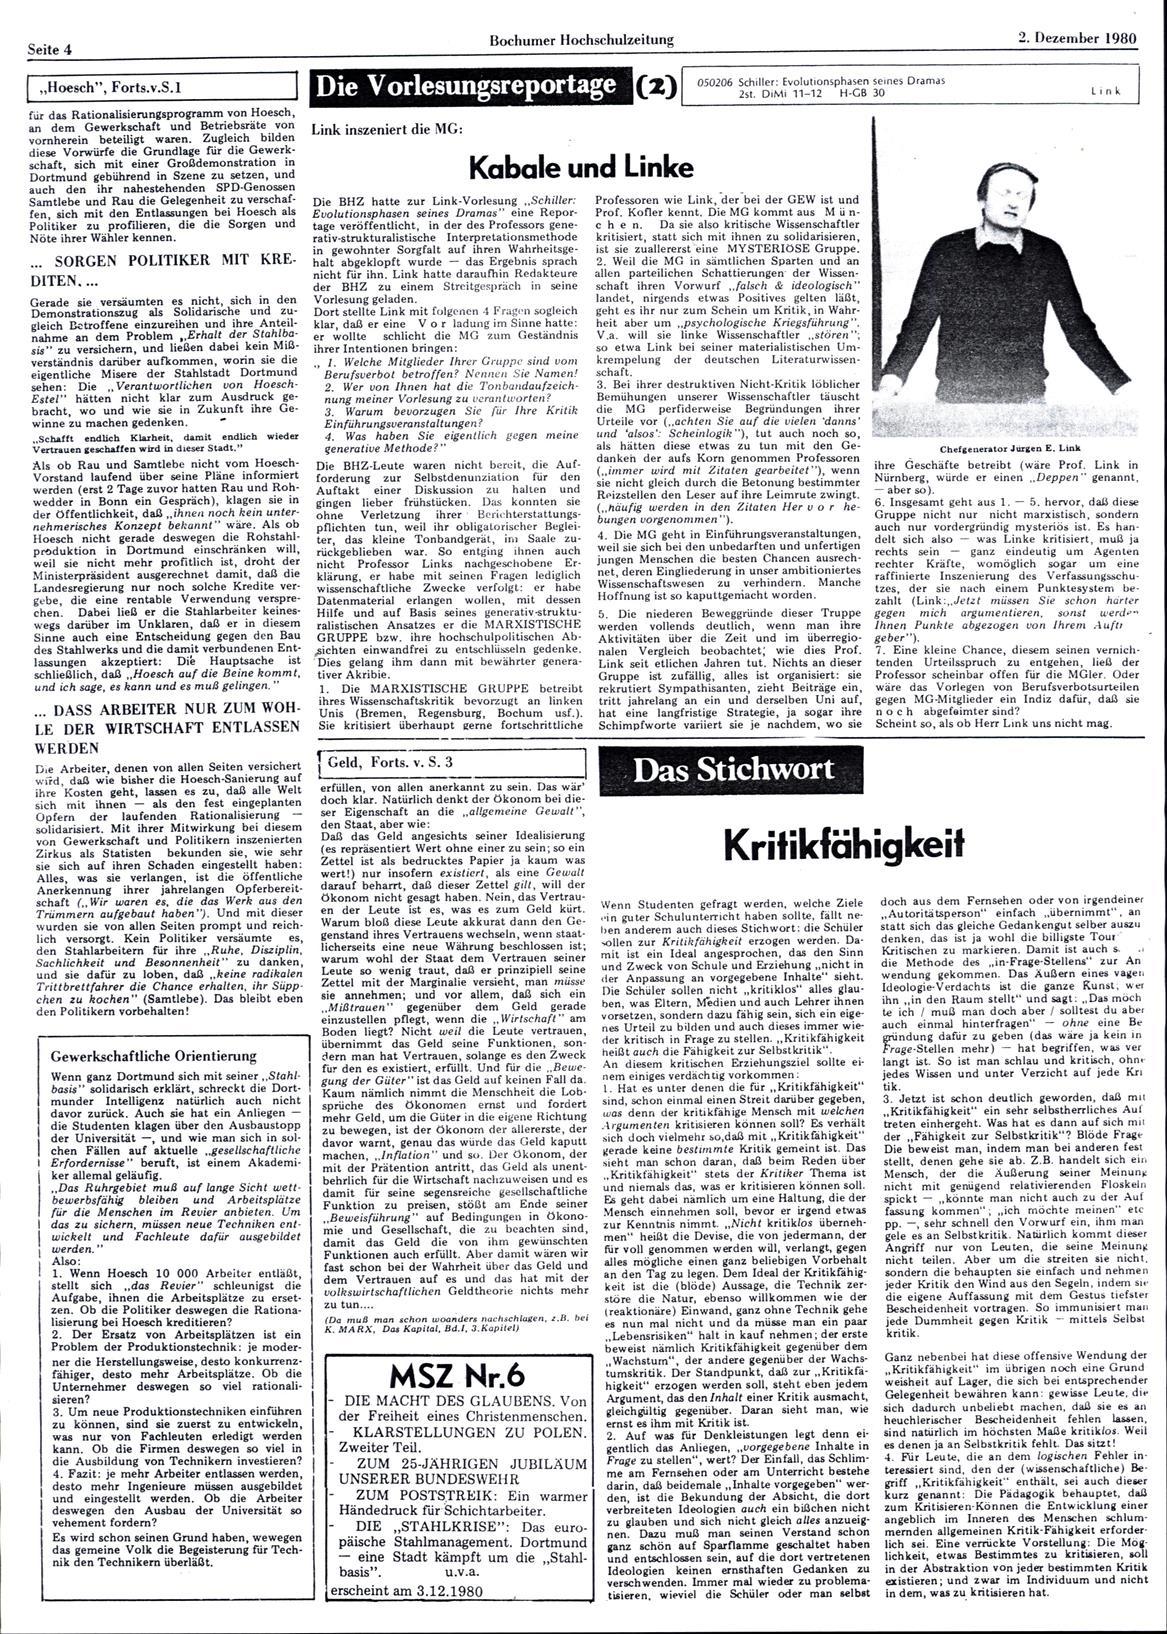 Bochum_BHZ_19801202_023_004